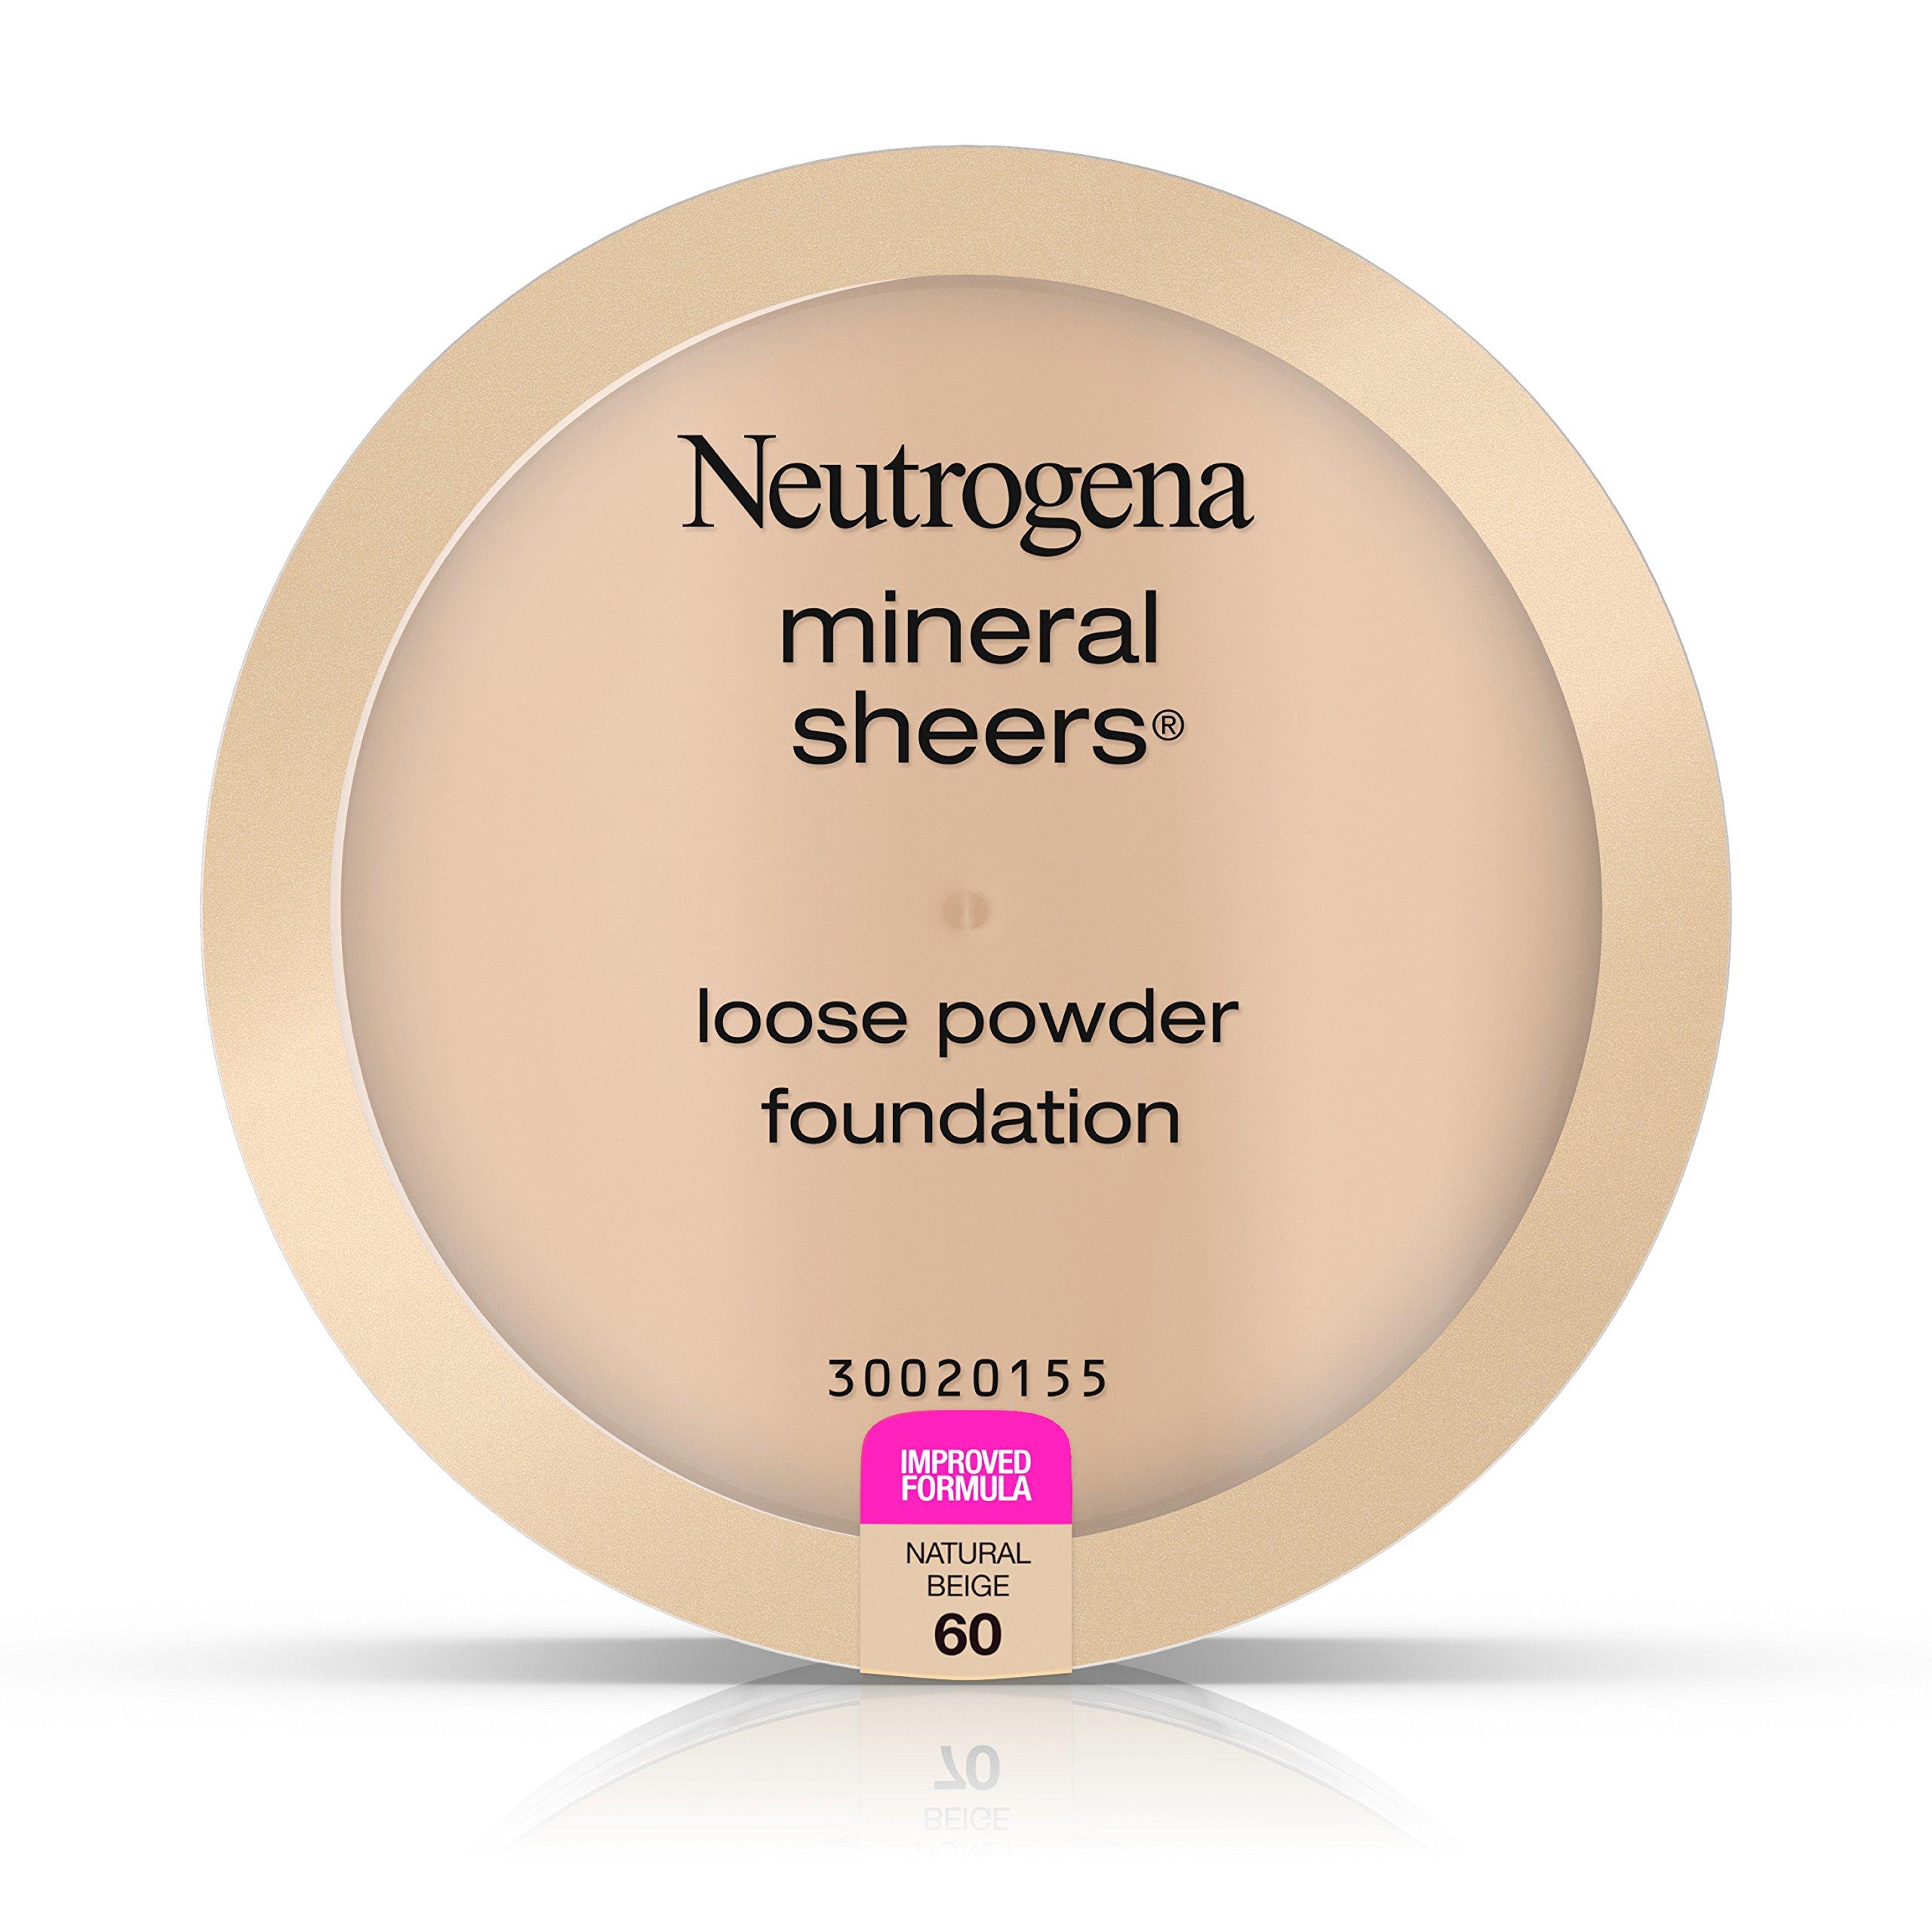 Neutrogena Mineral Sheers Loose Powder Foundation, Natural Beige 60, .19 Oz.